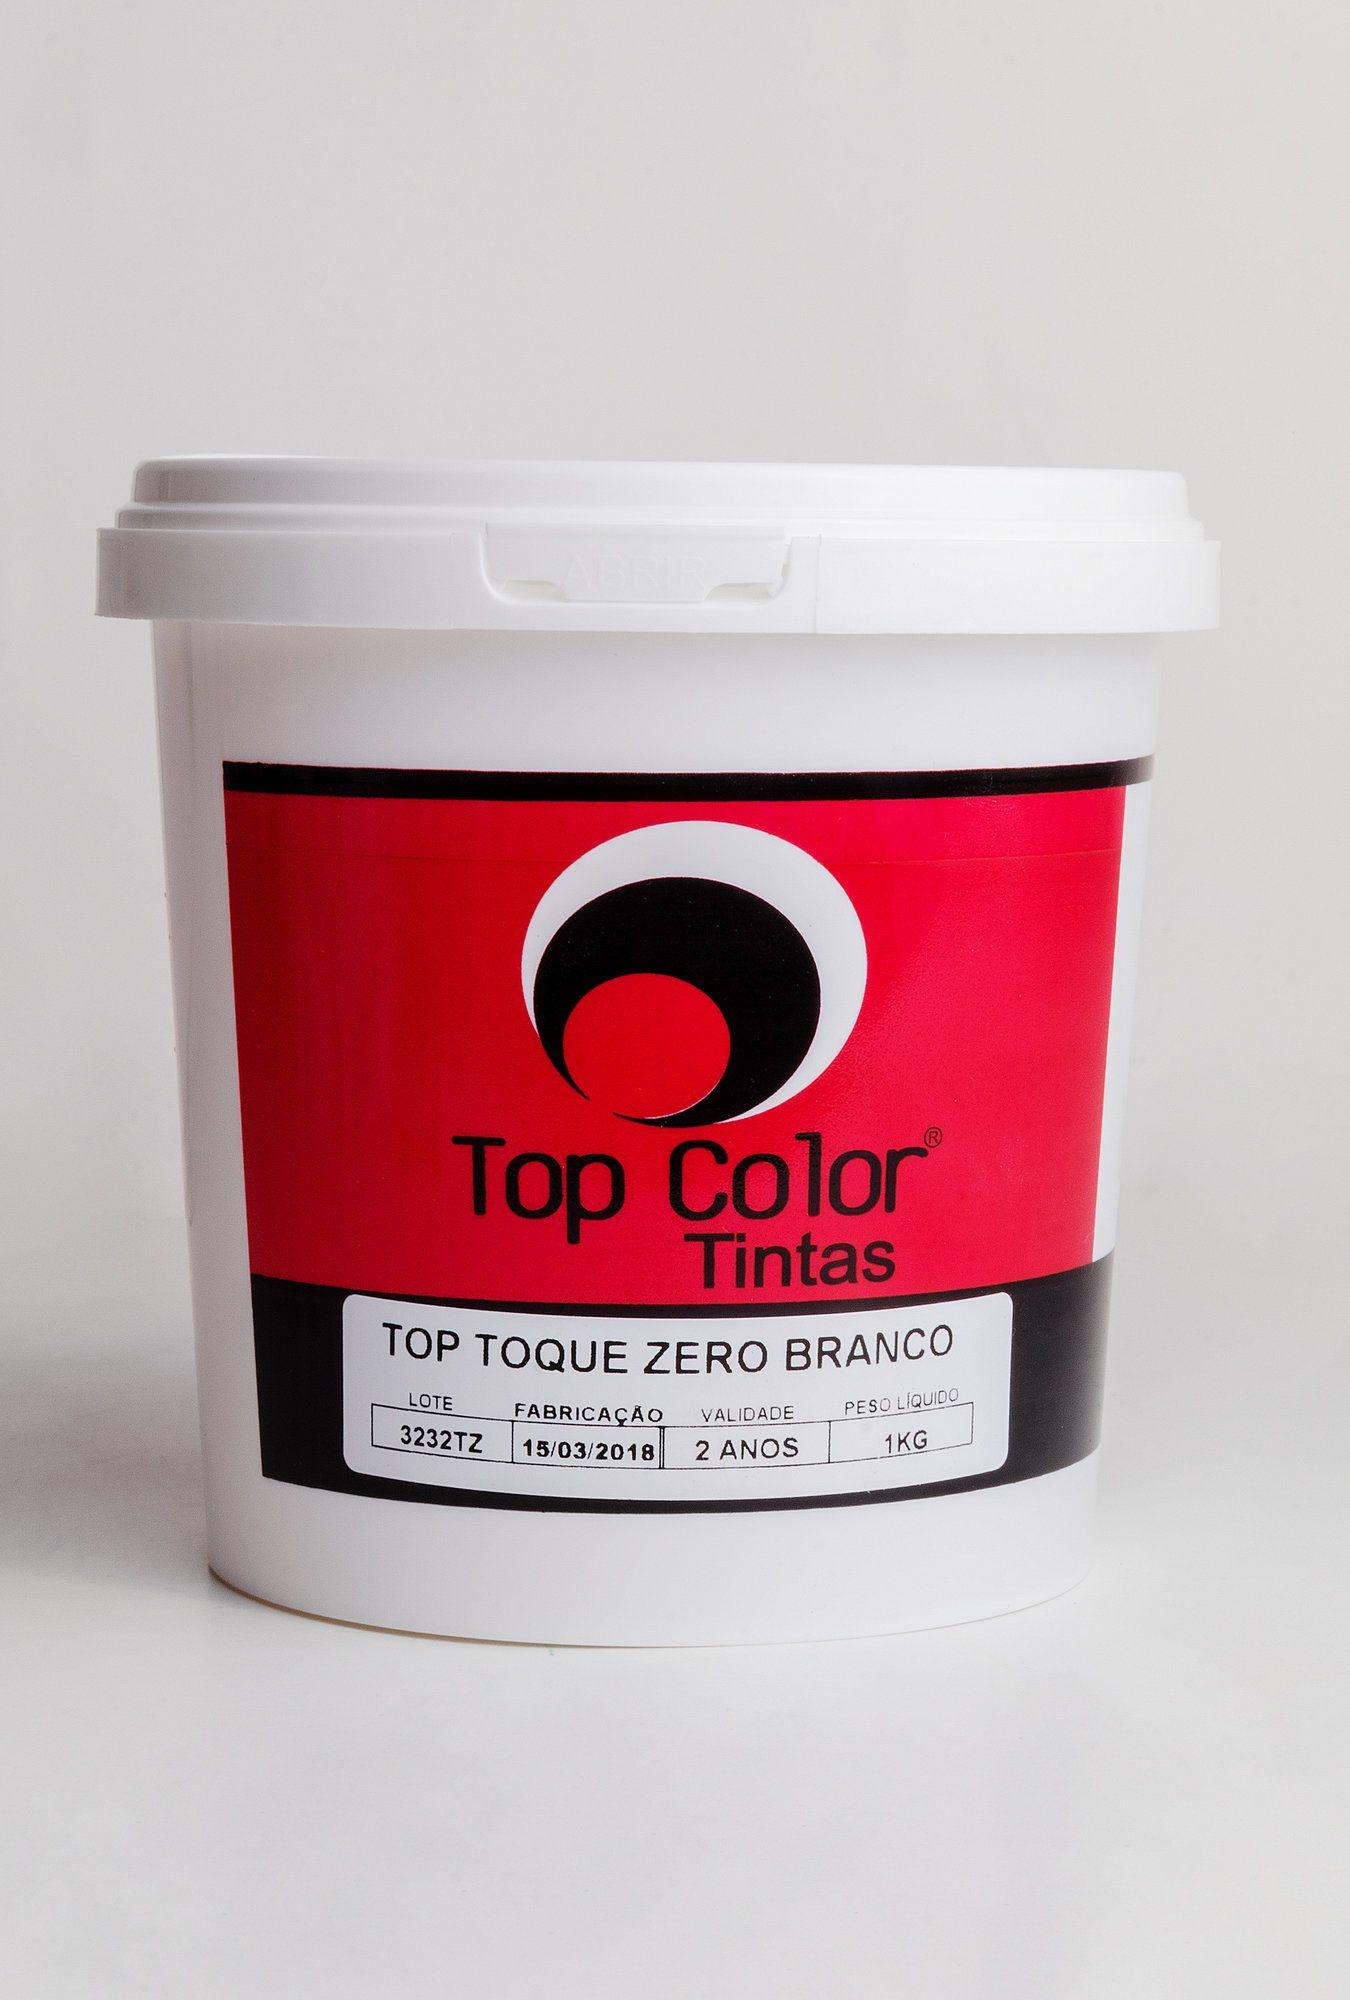 Top toque zero branco - 1kg